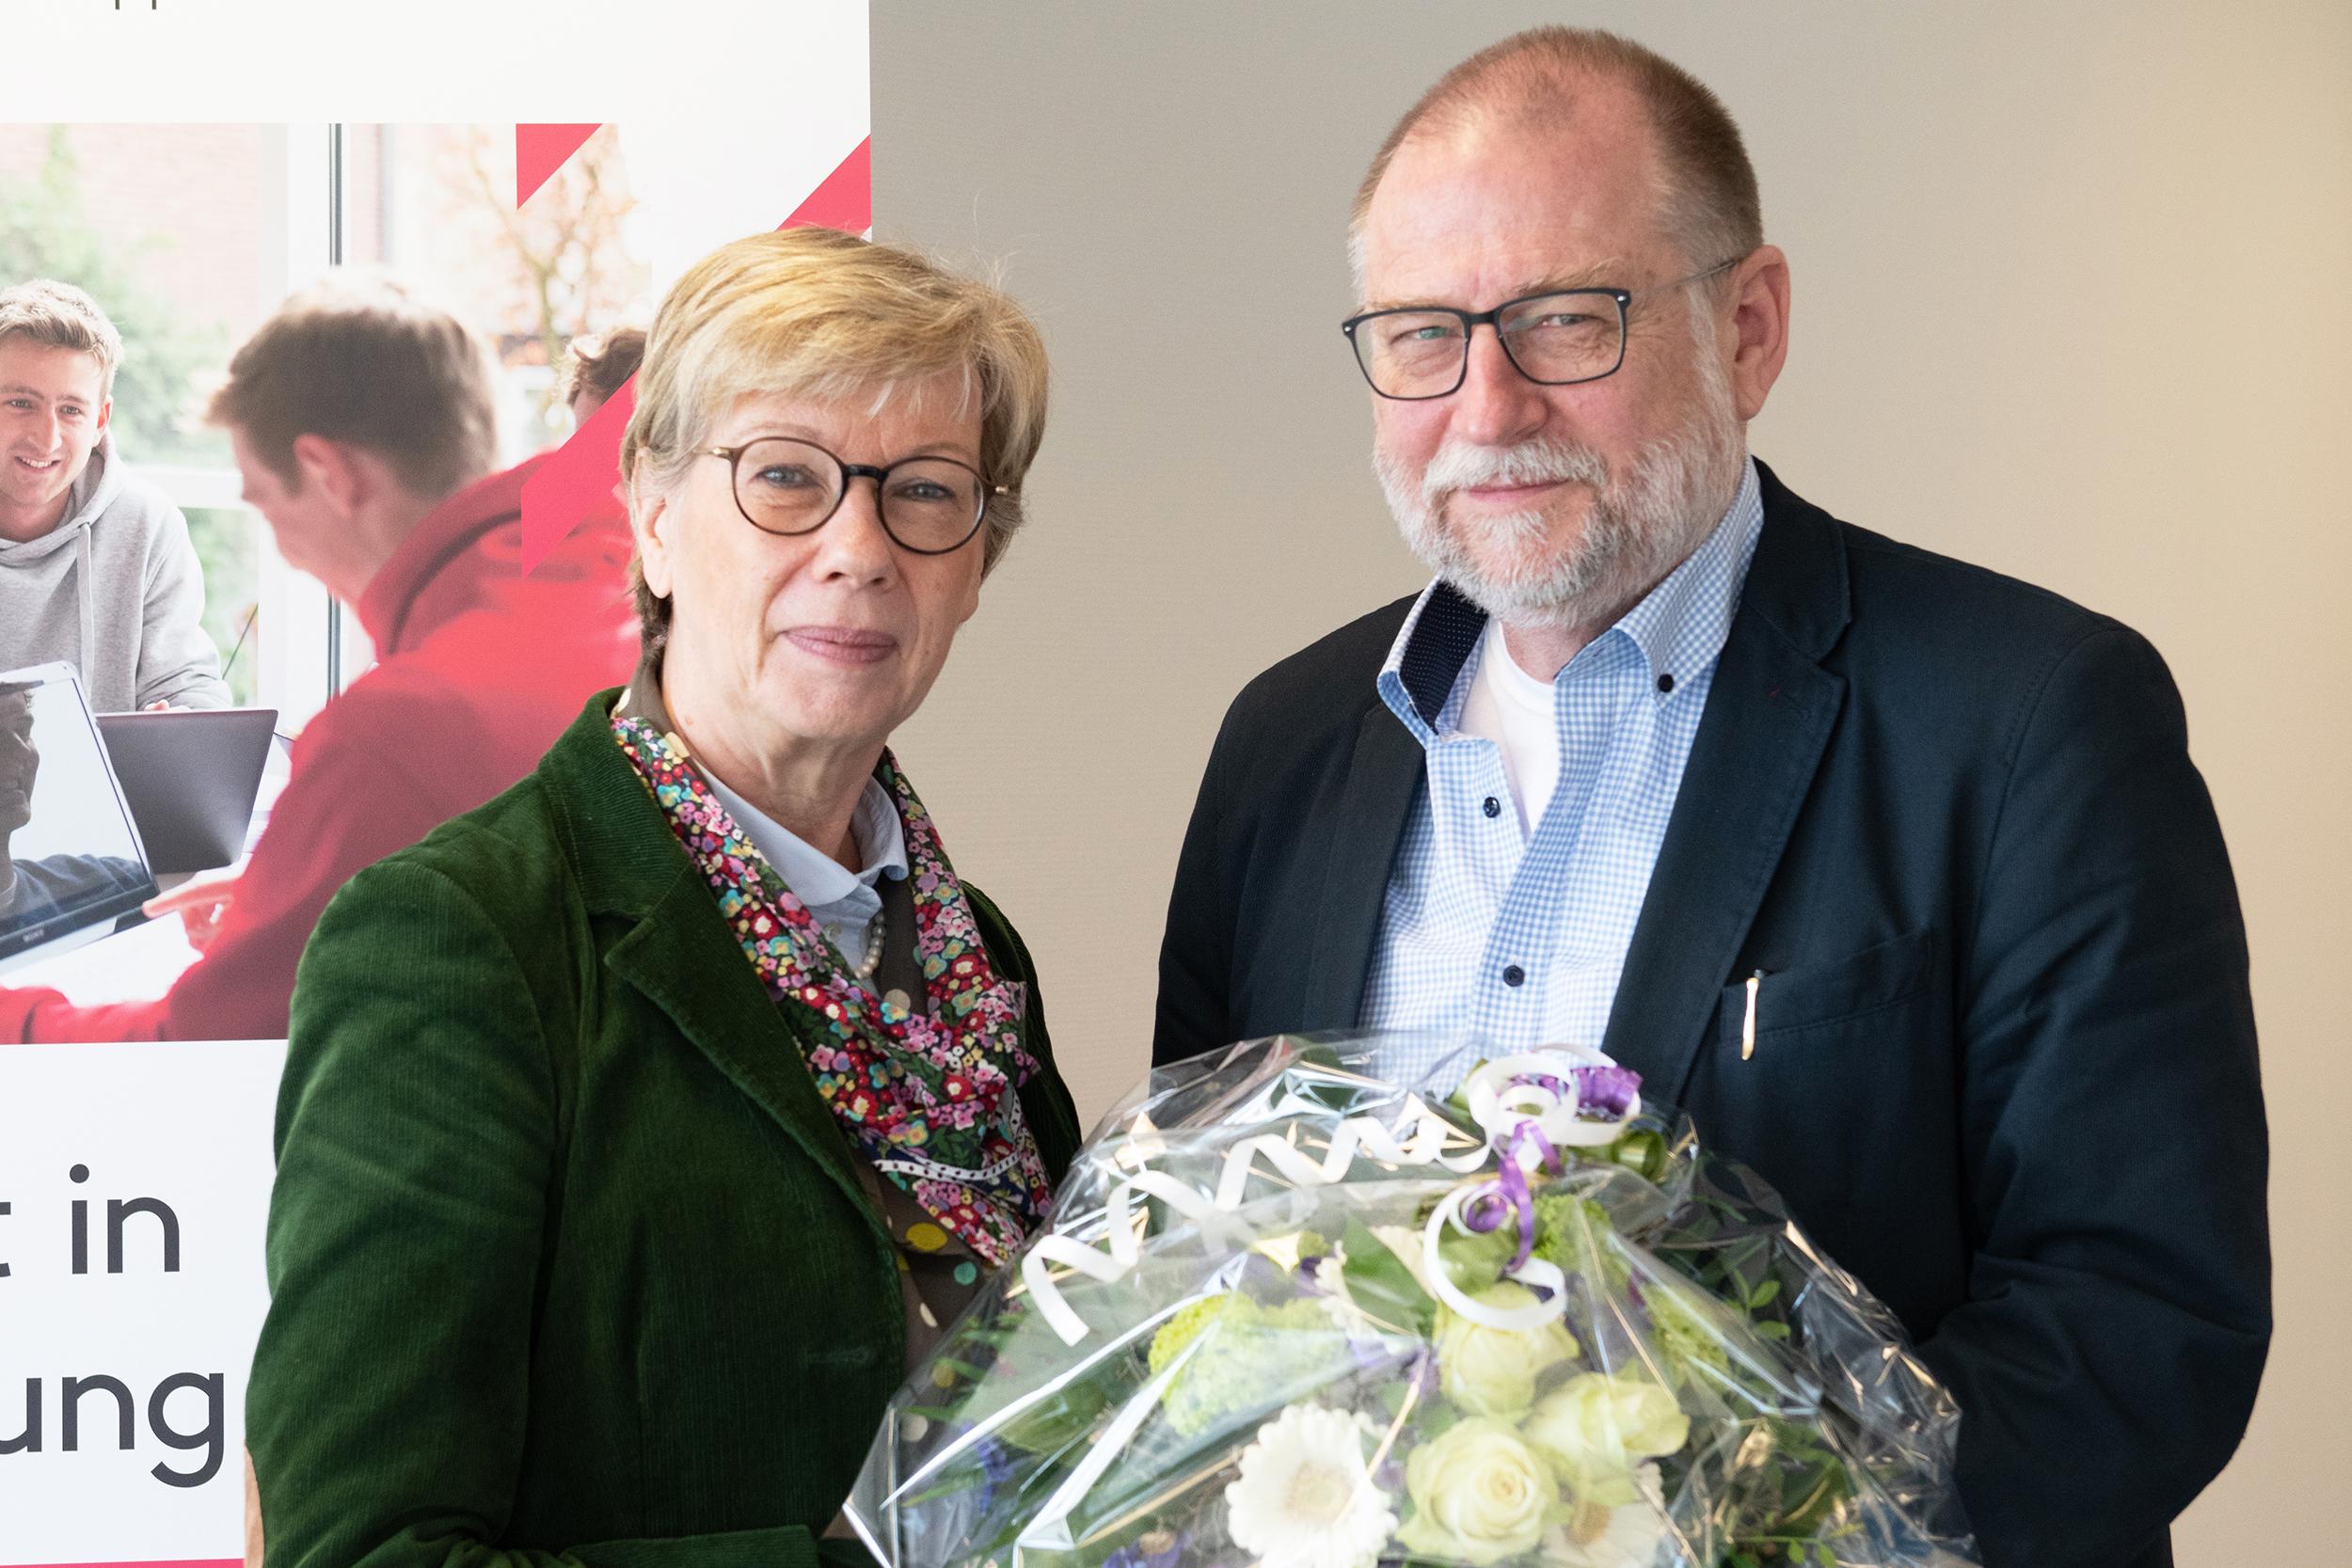 FH-Präsidentin Prof. Dr. Ute von Lojewski gratuliert dem Jubilar Prof. Dr. Horst Blatt.